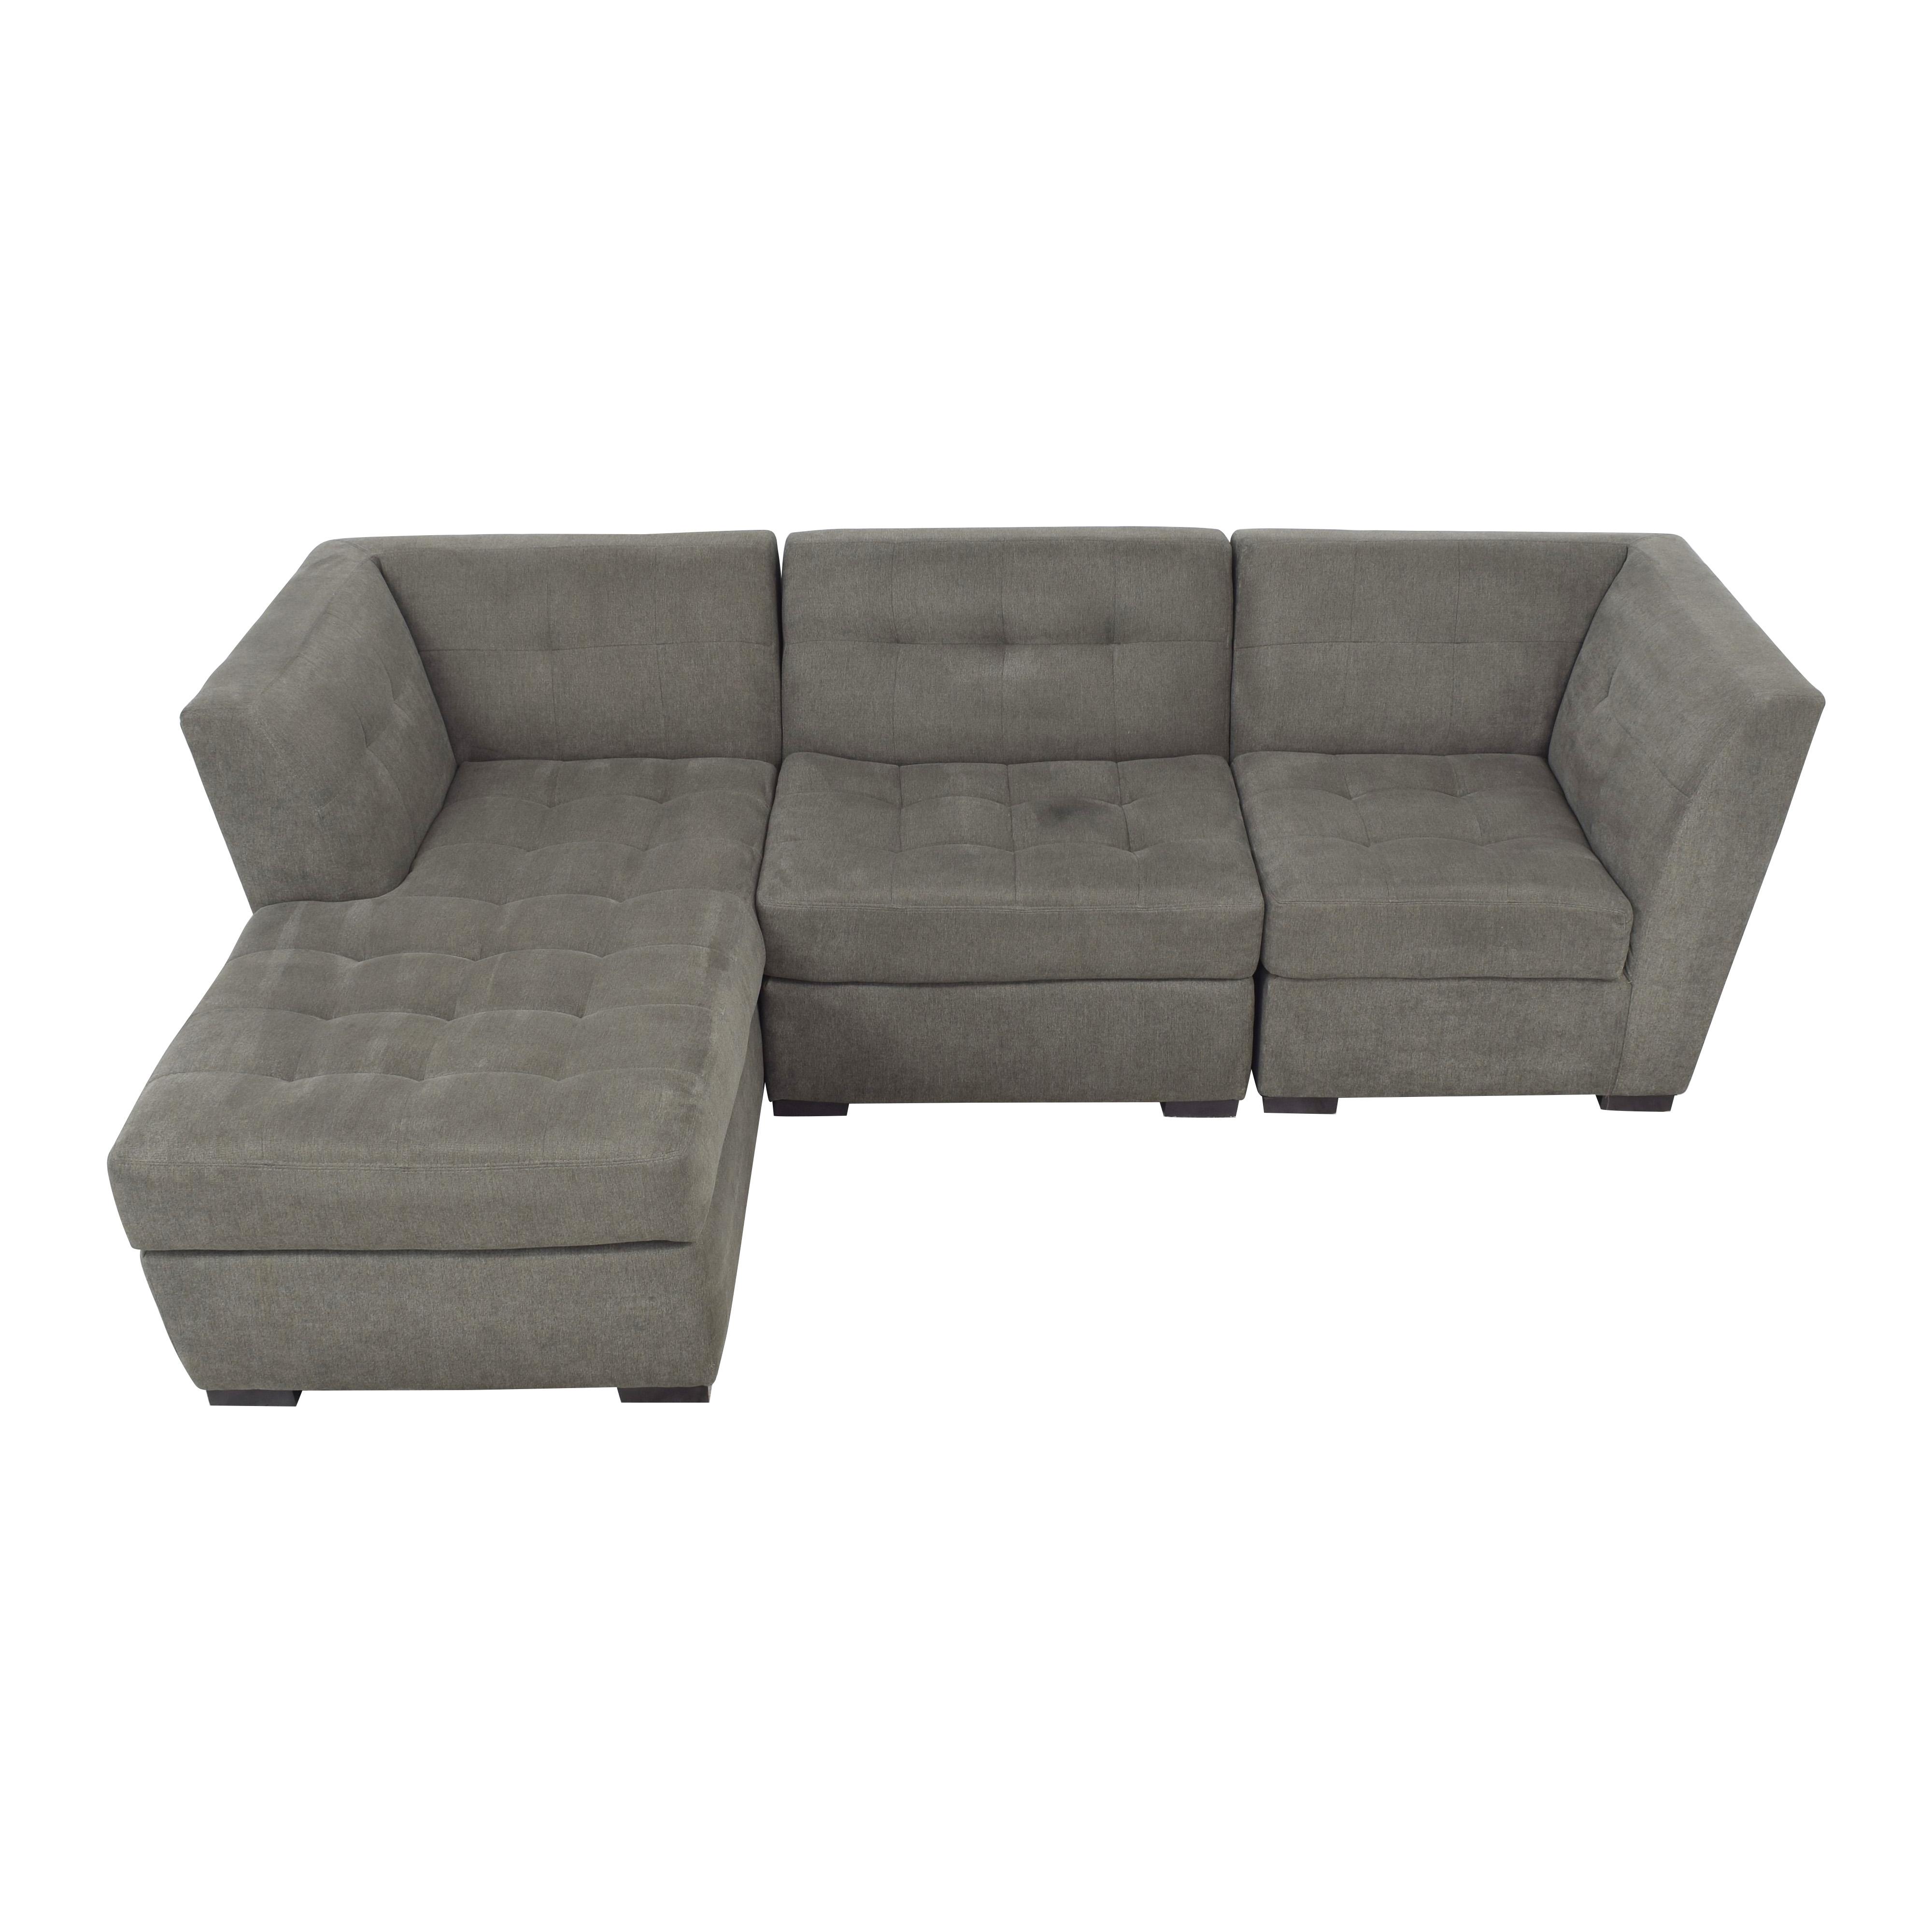 shop Jonathan Louis Jonathan Louis Roxanne II Chaise Sectional Sofa online